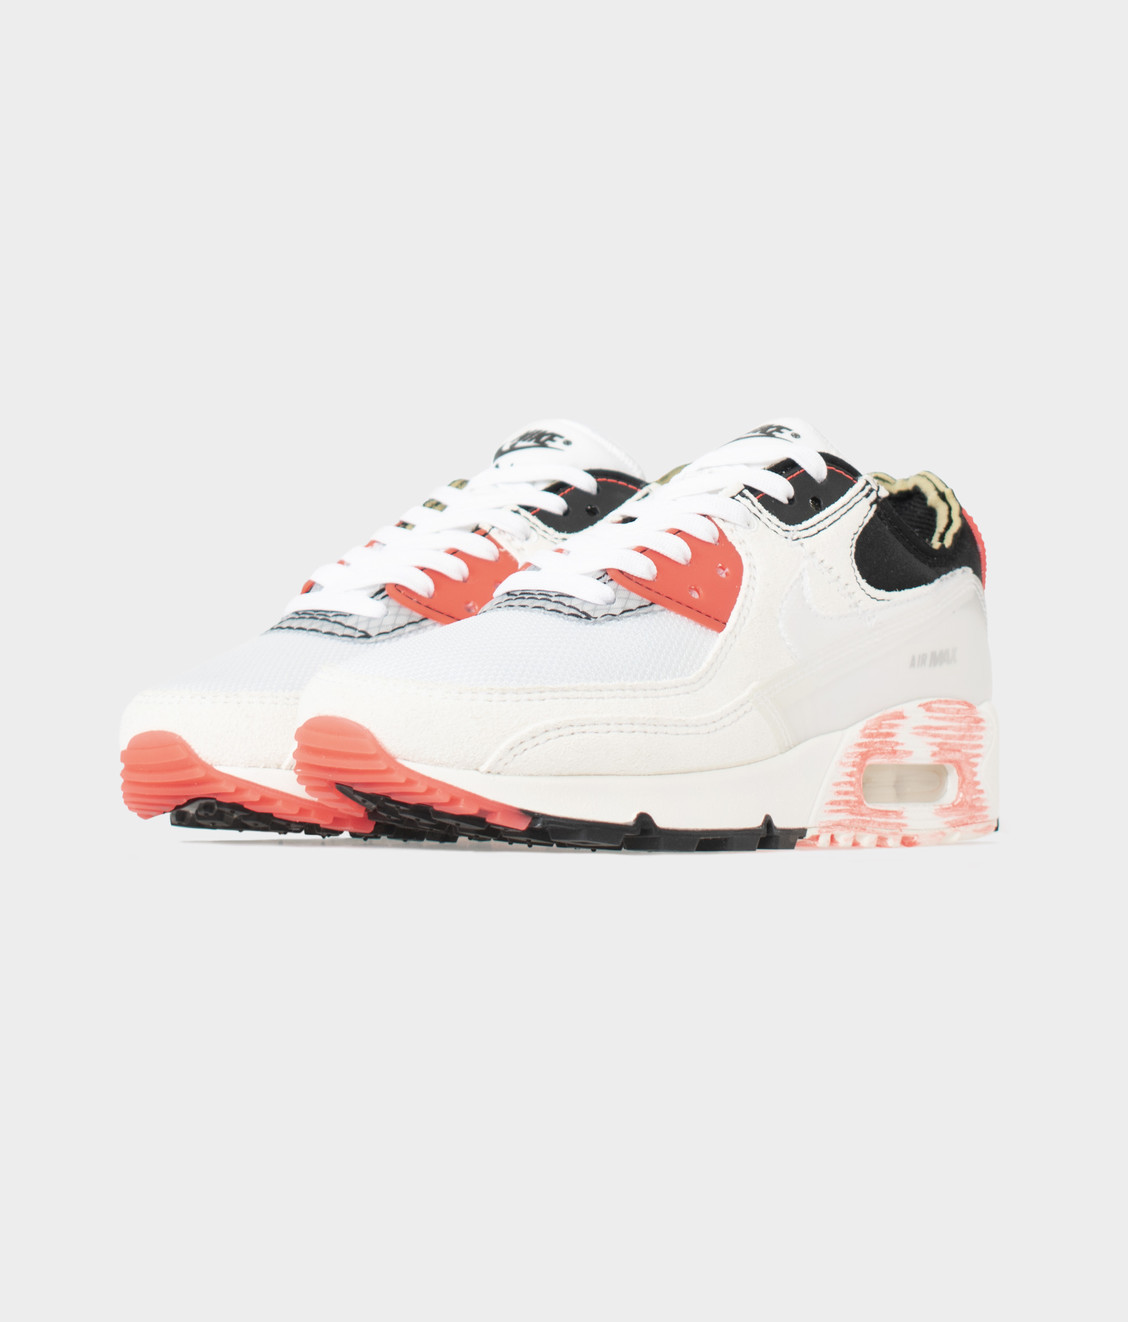 Nike Nike Air Max 90 (III) PRM Archetype